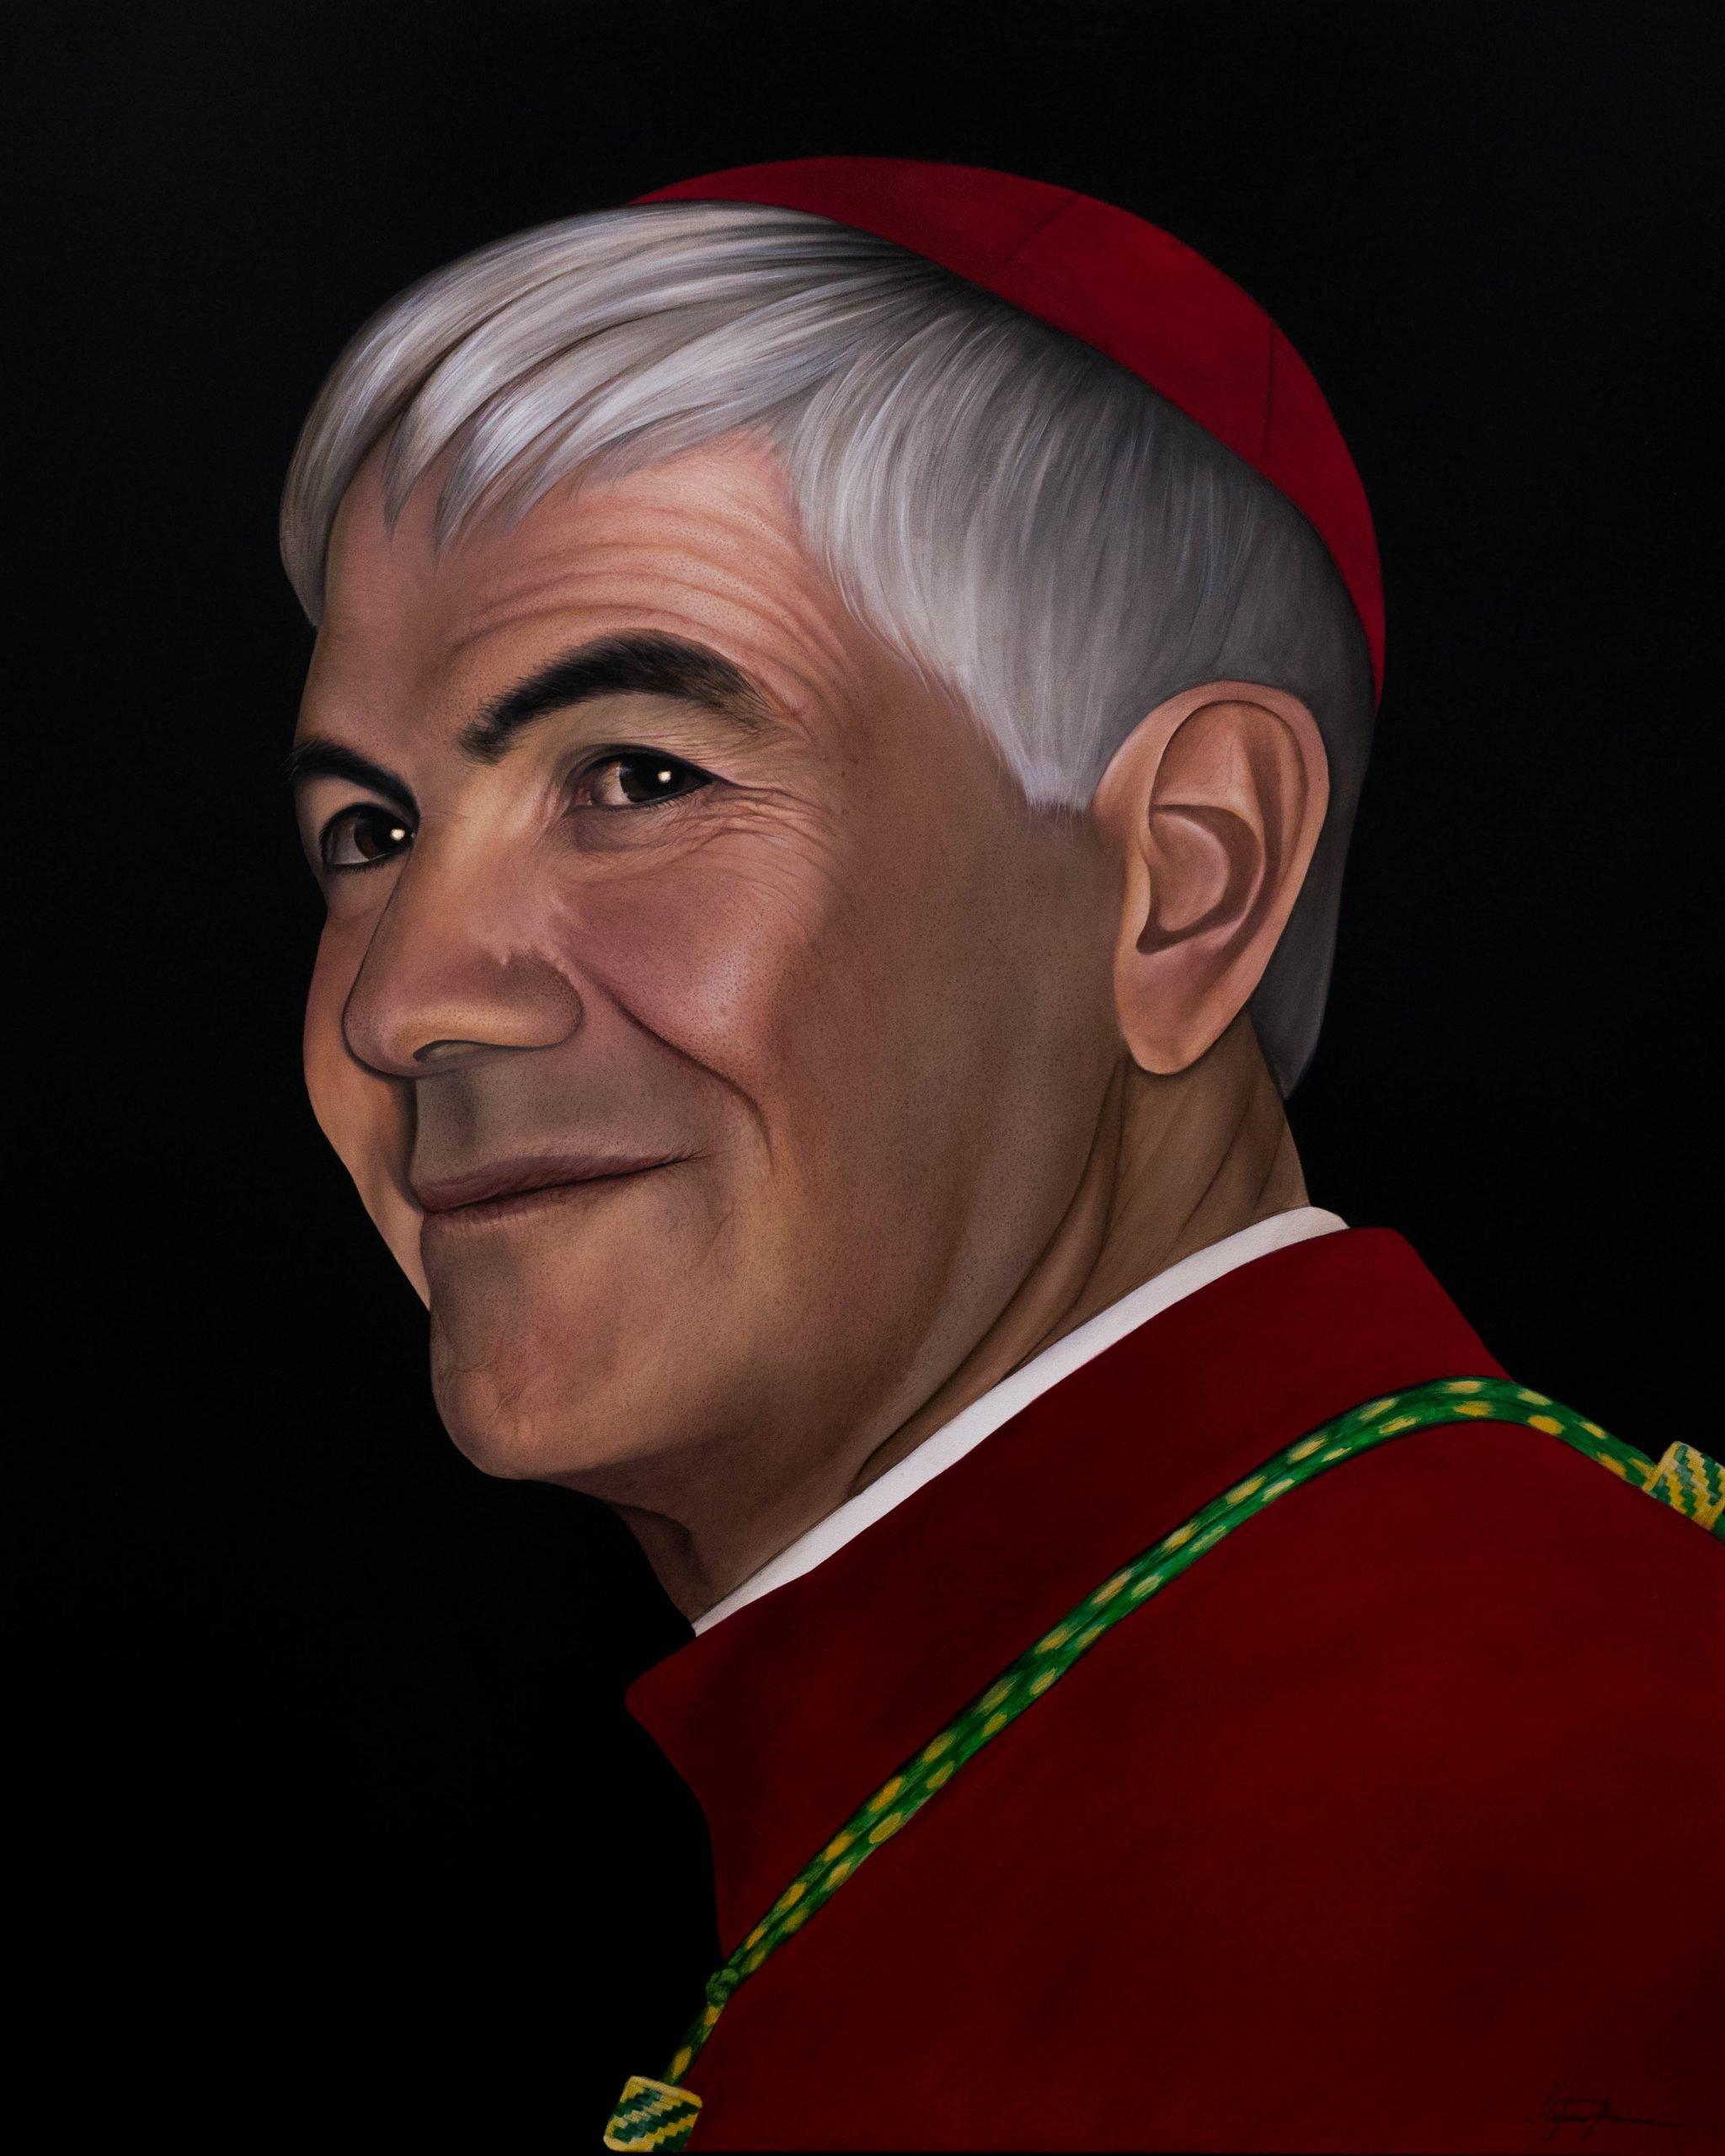 Mons. Don Giovanni D'Ercole